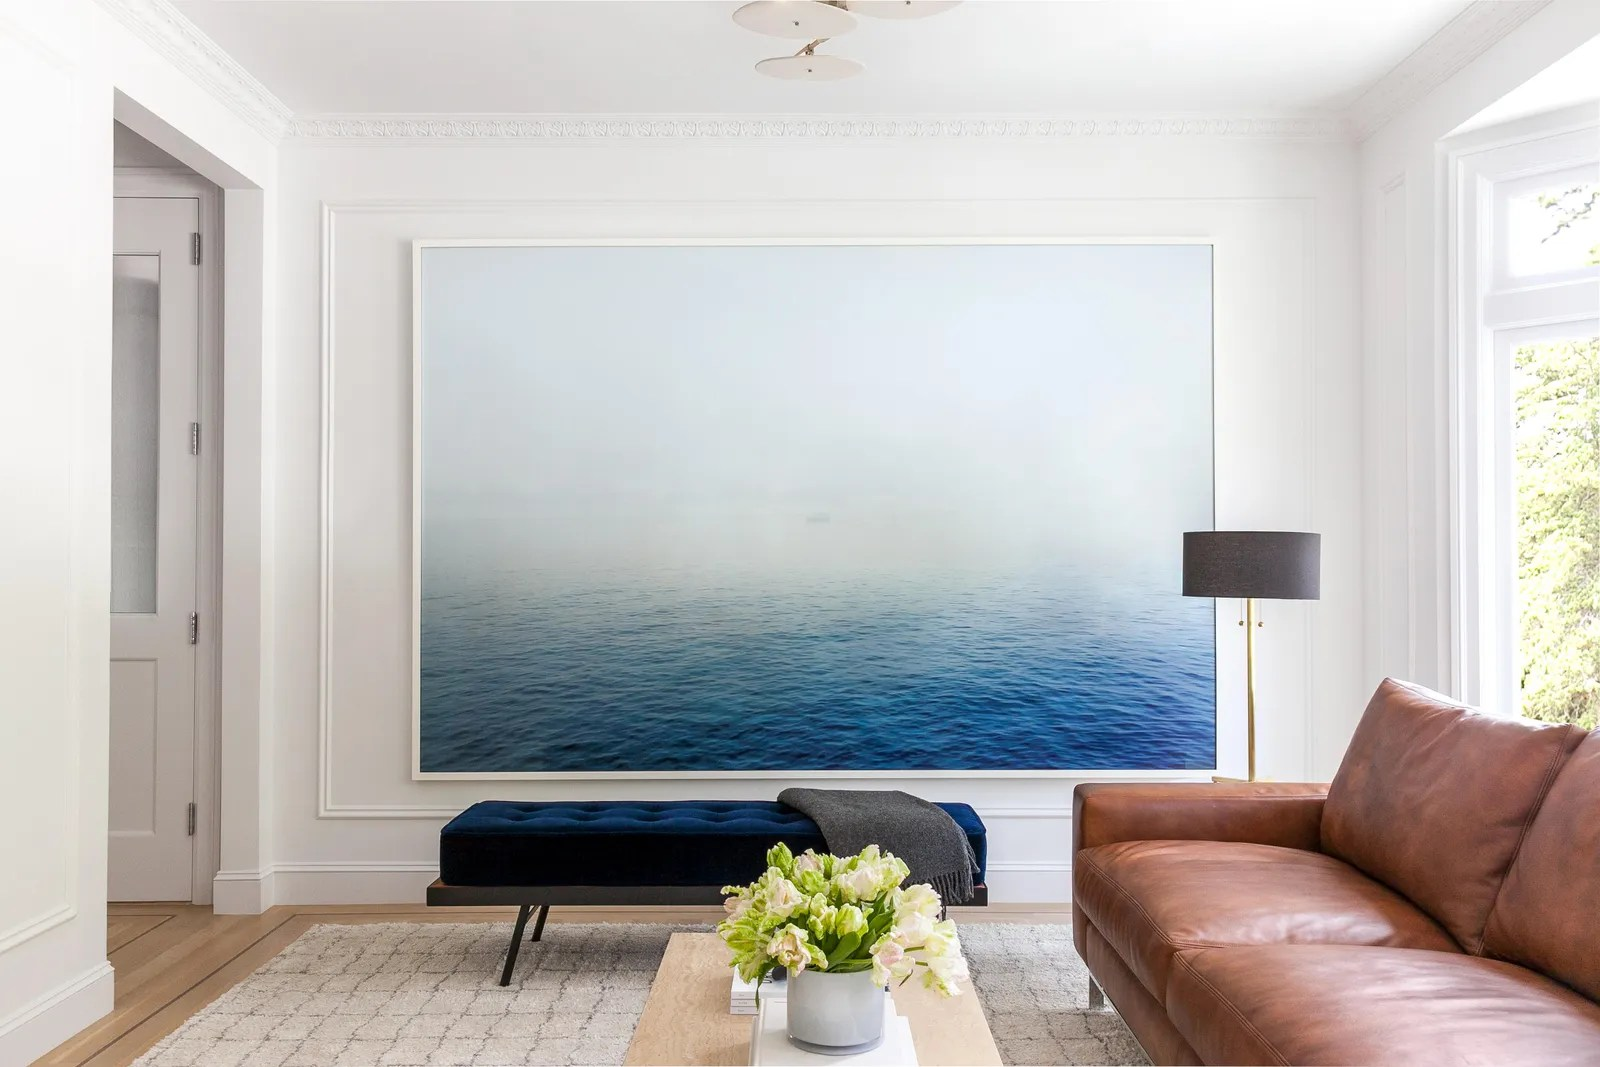 11 wall decor ideas